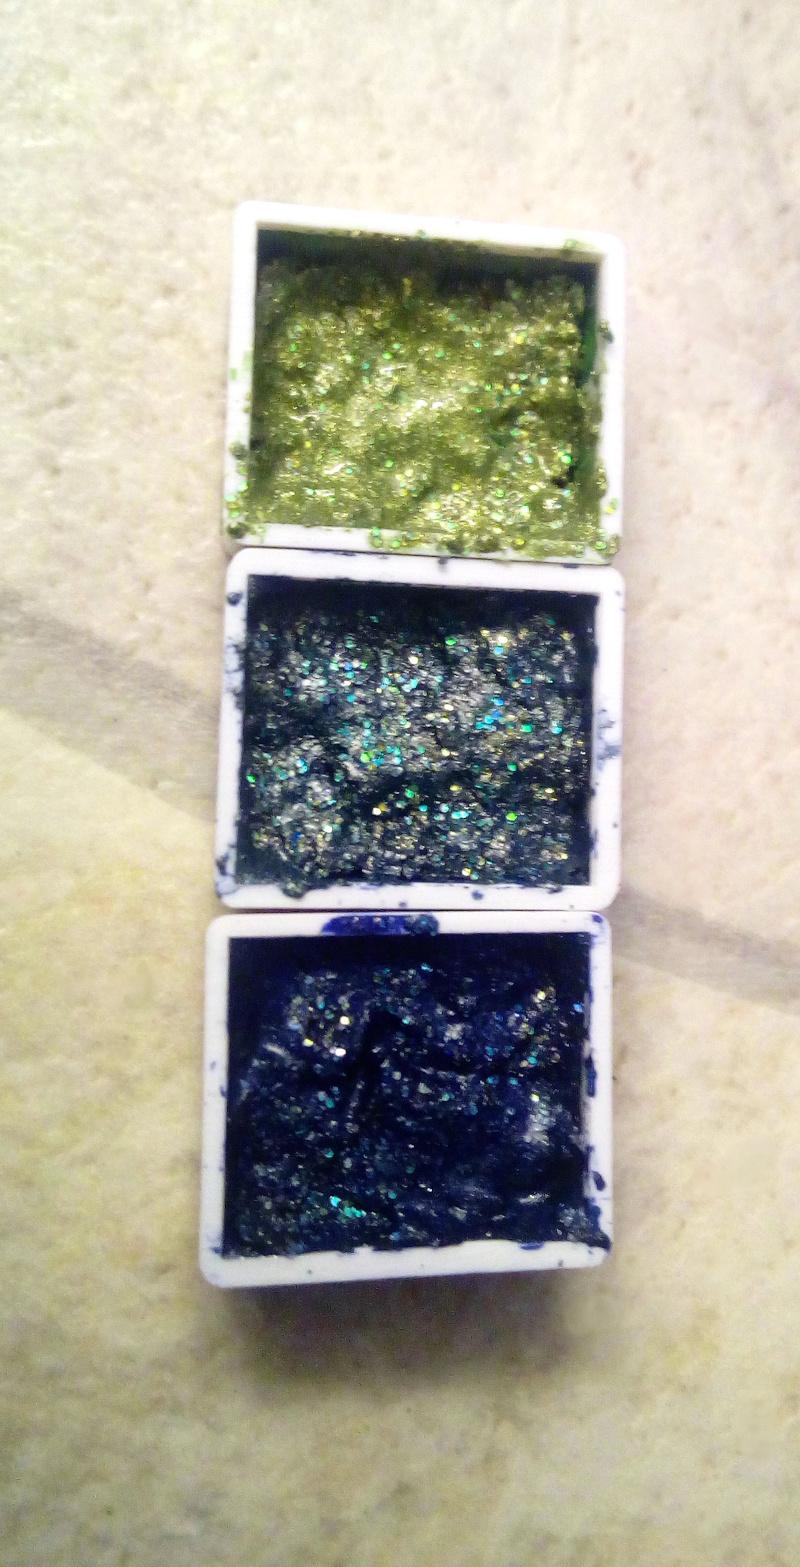 sockes farbenbrauerei - glitzernde Schimmer Farben - Aquarellfarben herstellen